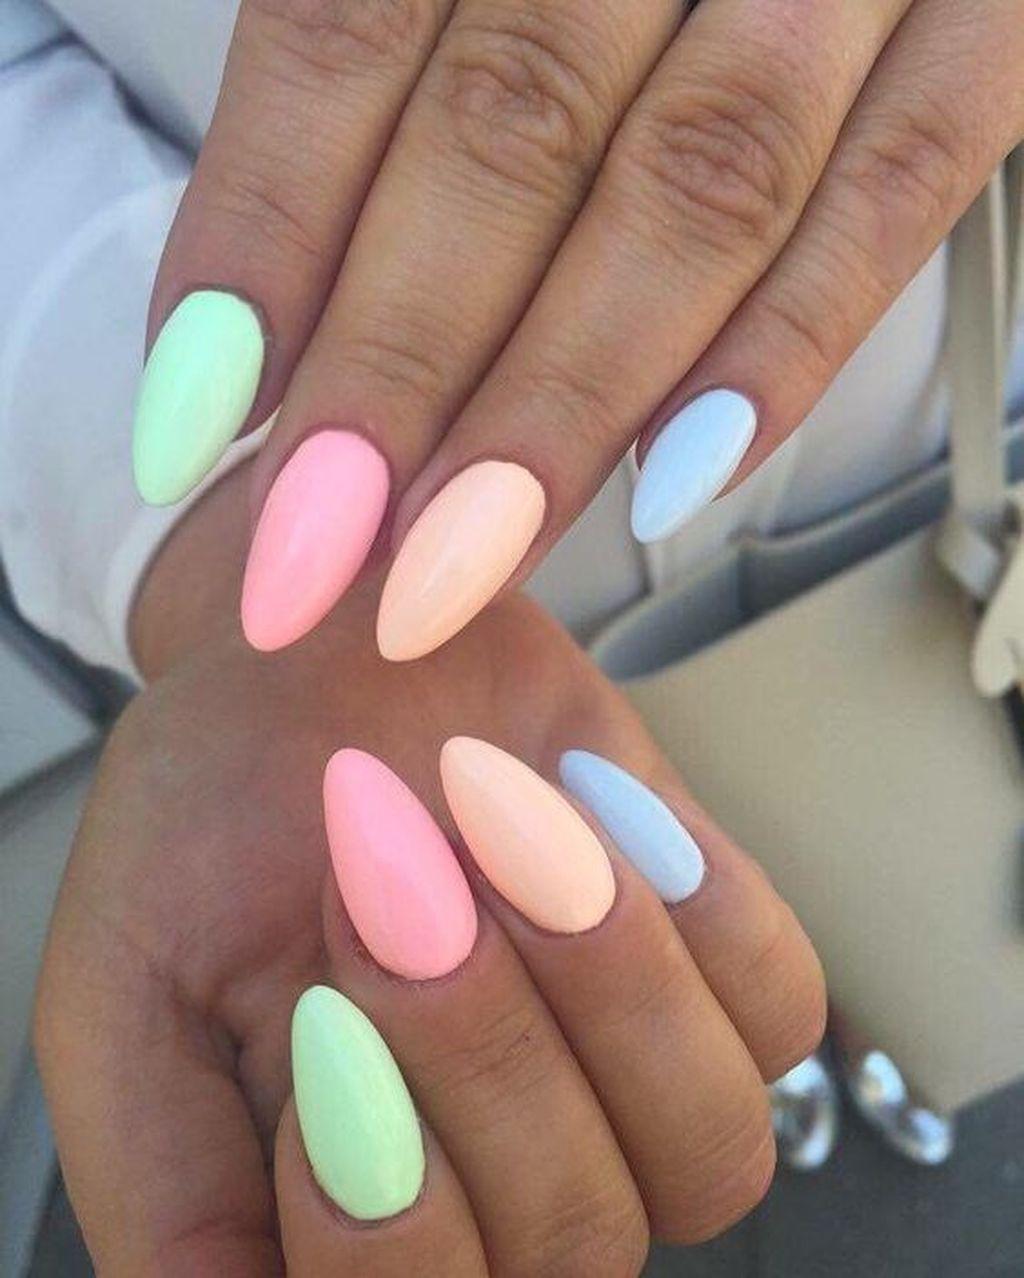 30 Gorgeous Natural Summer Nail Color Designs Ideas In 2020 Pastelove Nehty Gelove Nehty Design Nehtu